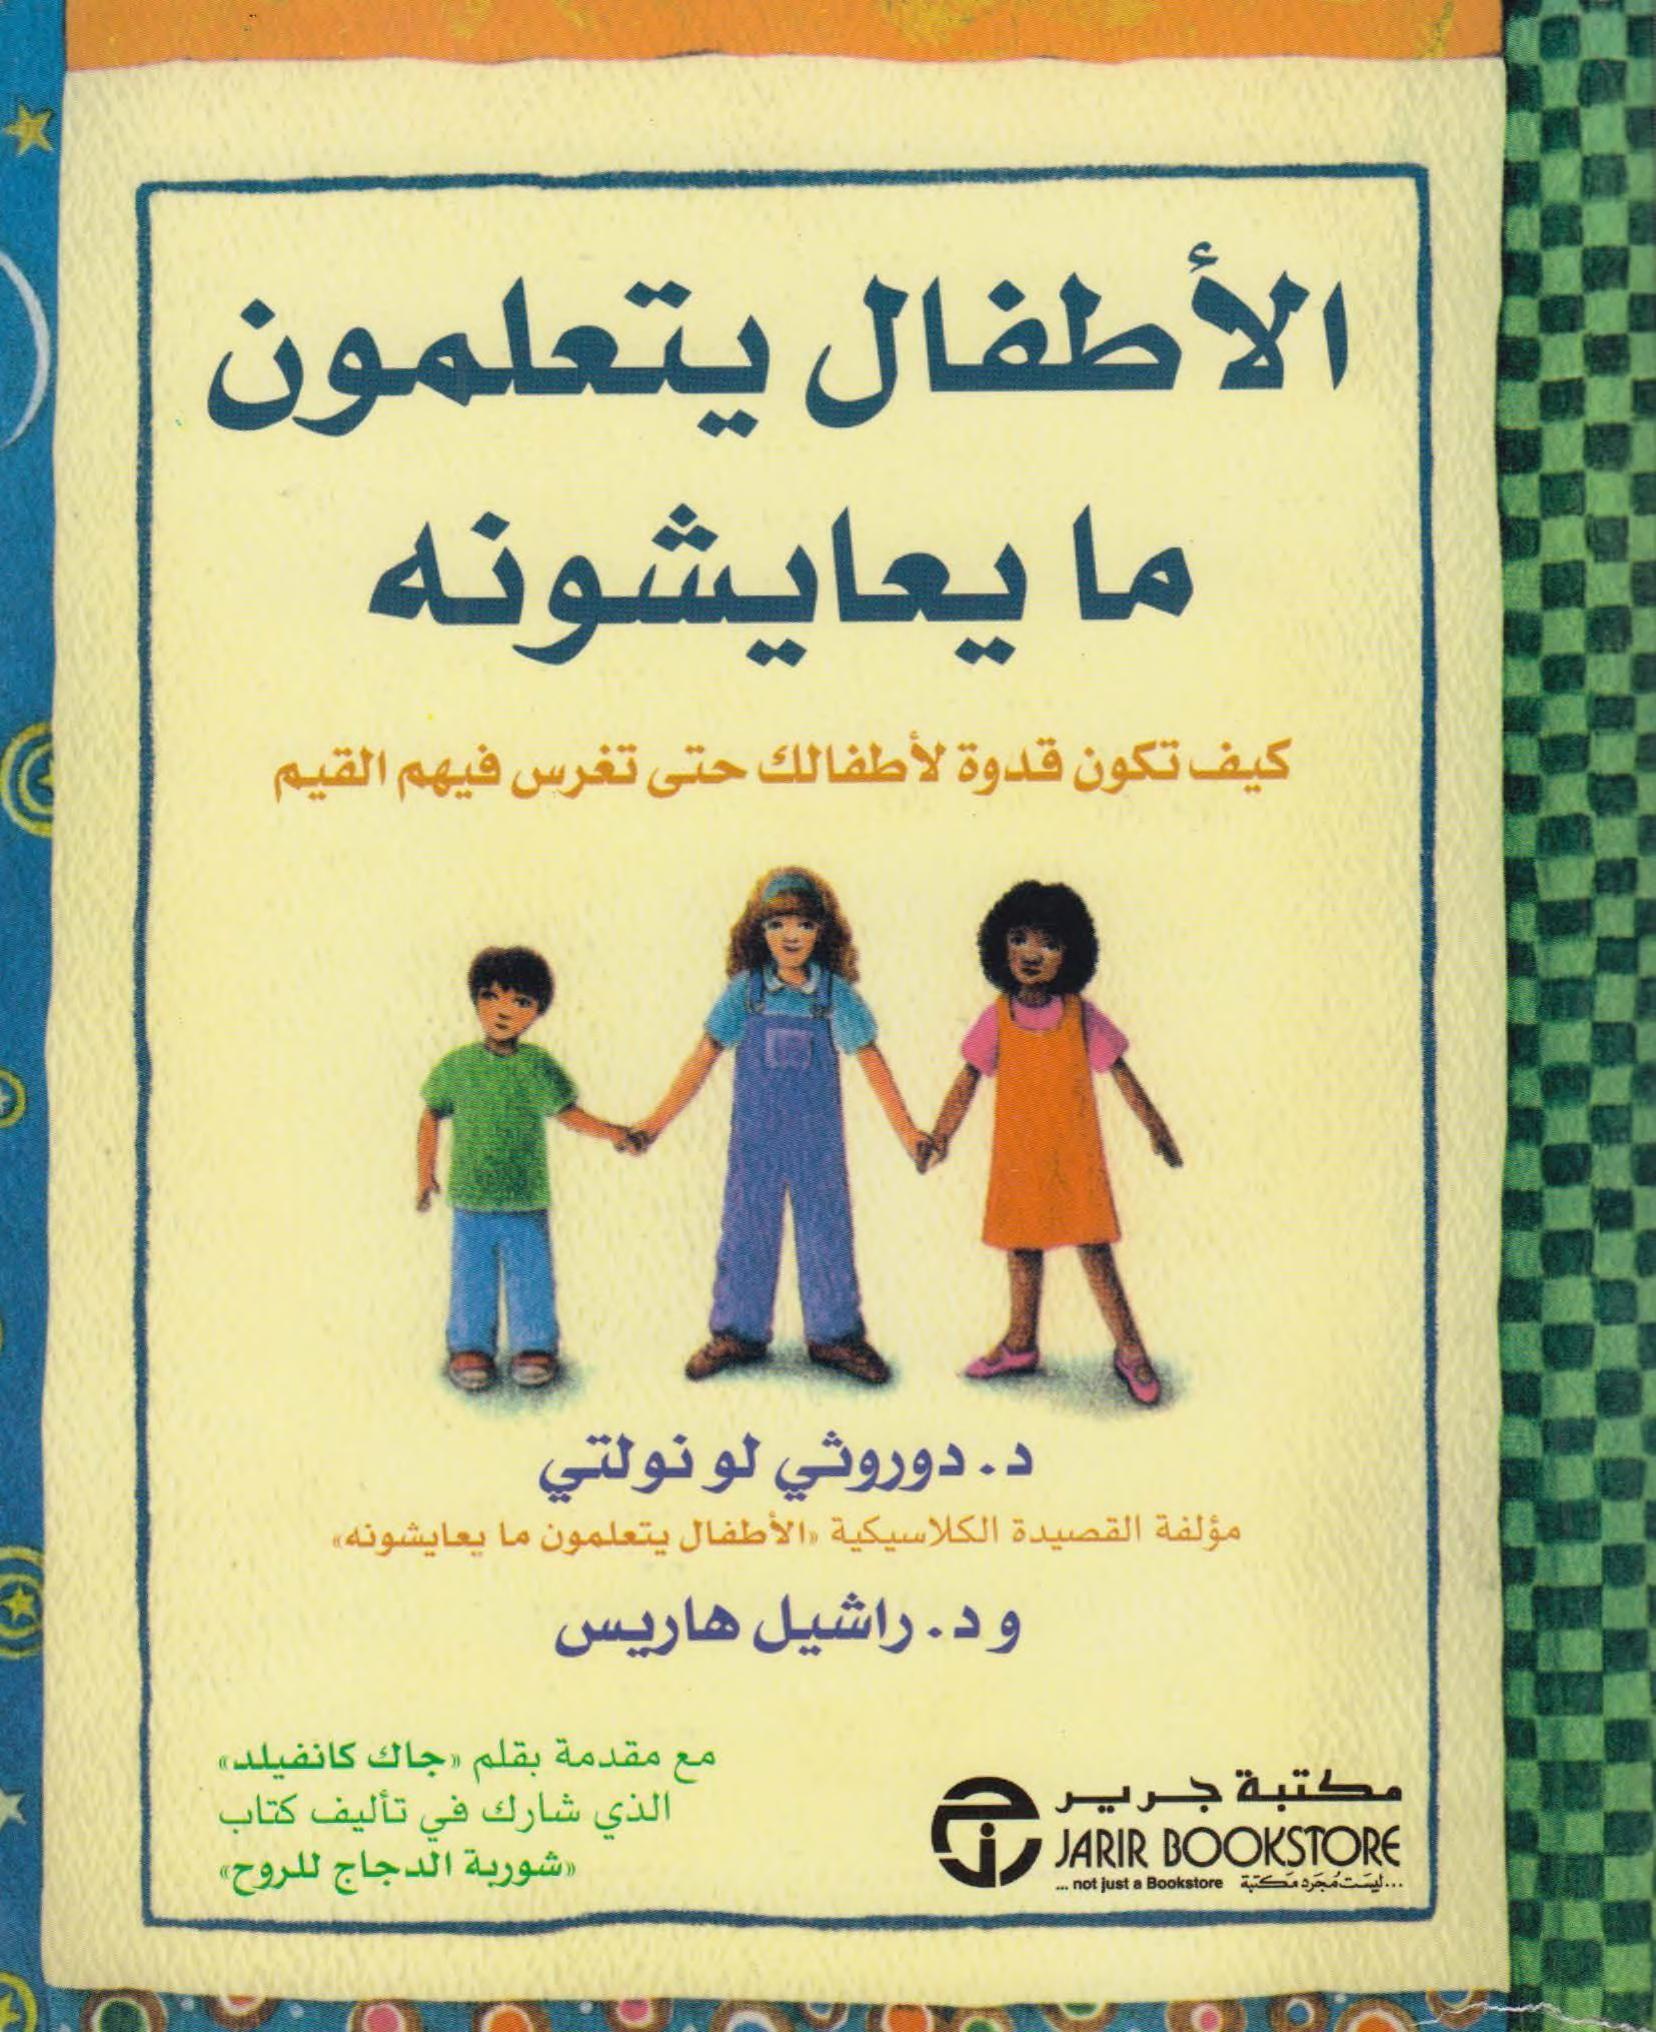 الأطفال يتعلمون ما يعايشونه Free Download Borrow And Streaming Internet Archive In 2021 Pdf Books Reading Arabic Books Books To Read